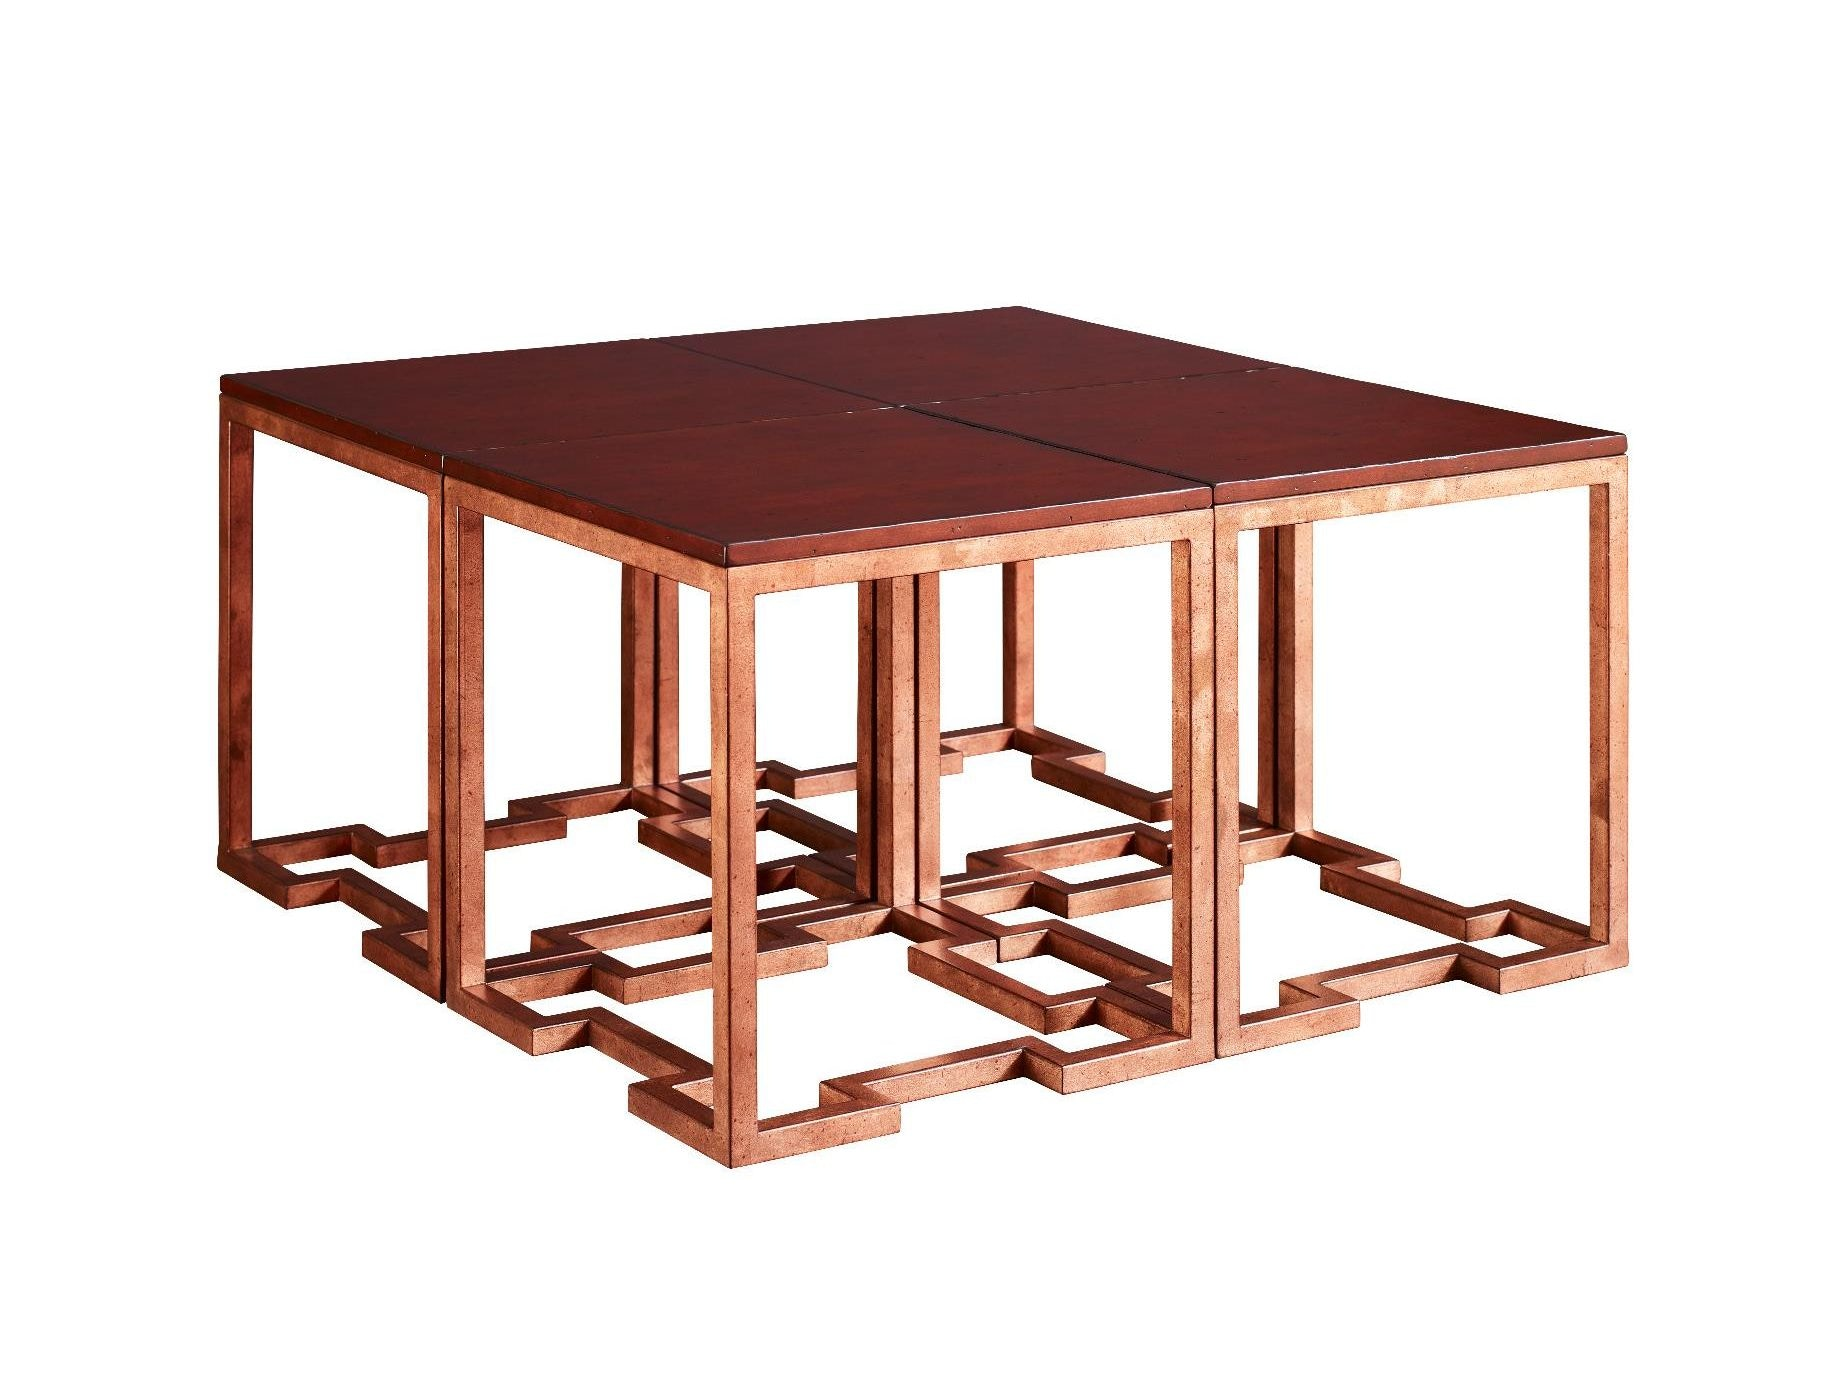 Fine Furniture Design Living Room Cocktail Table 1160 920 At Rider Furniture